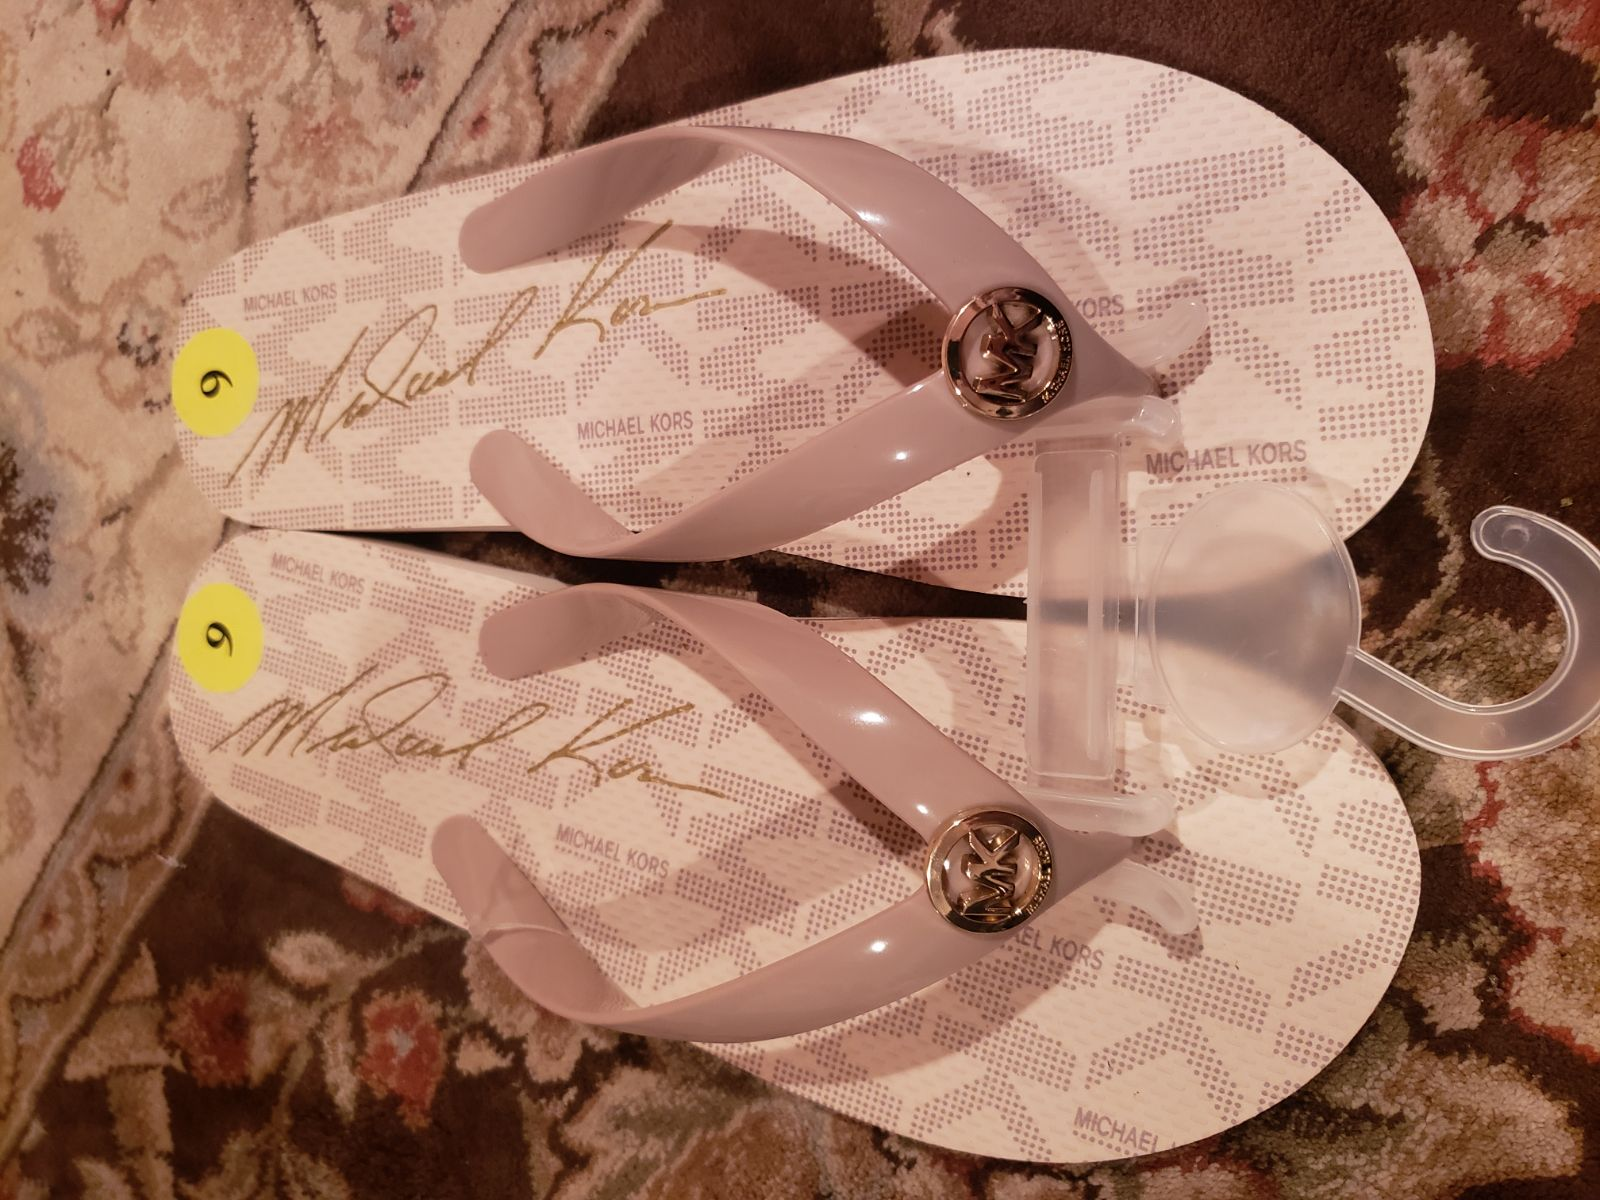 Michael Kors Pink Sandals MK Flip Flops